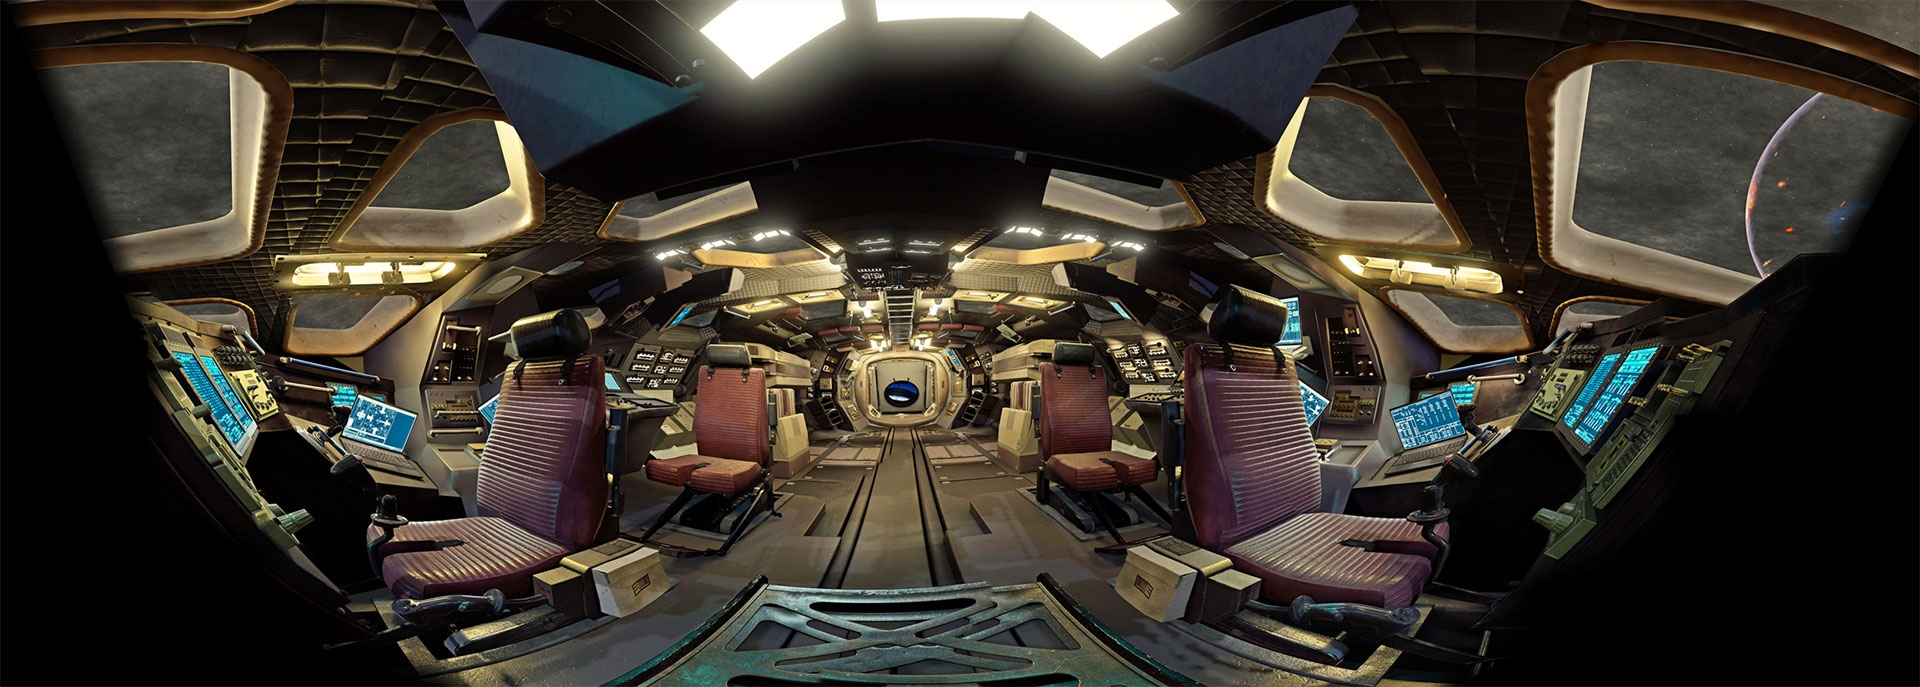 Framestore\'s Resh Sidhu on creative Virtual Reality experiences